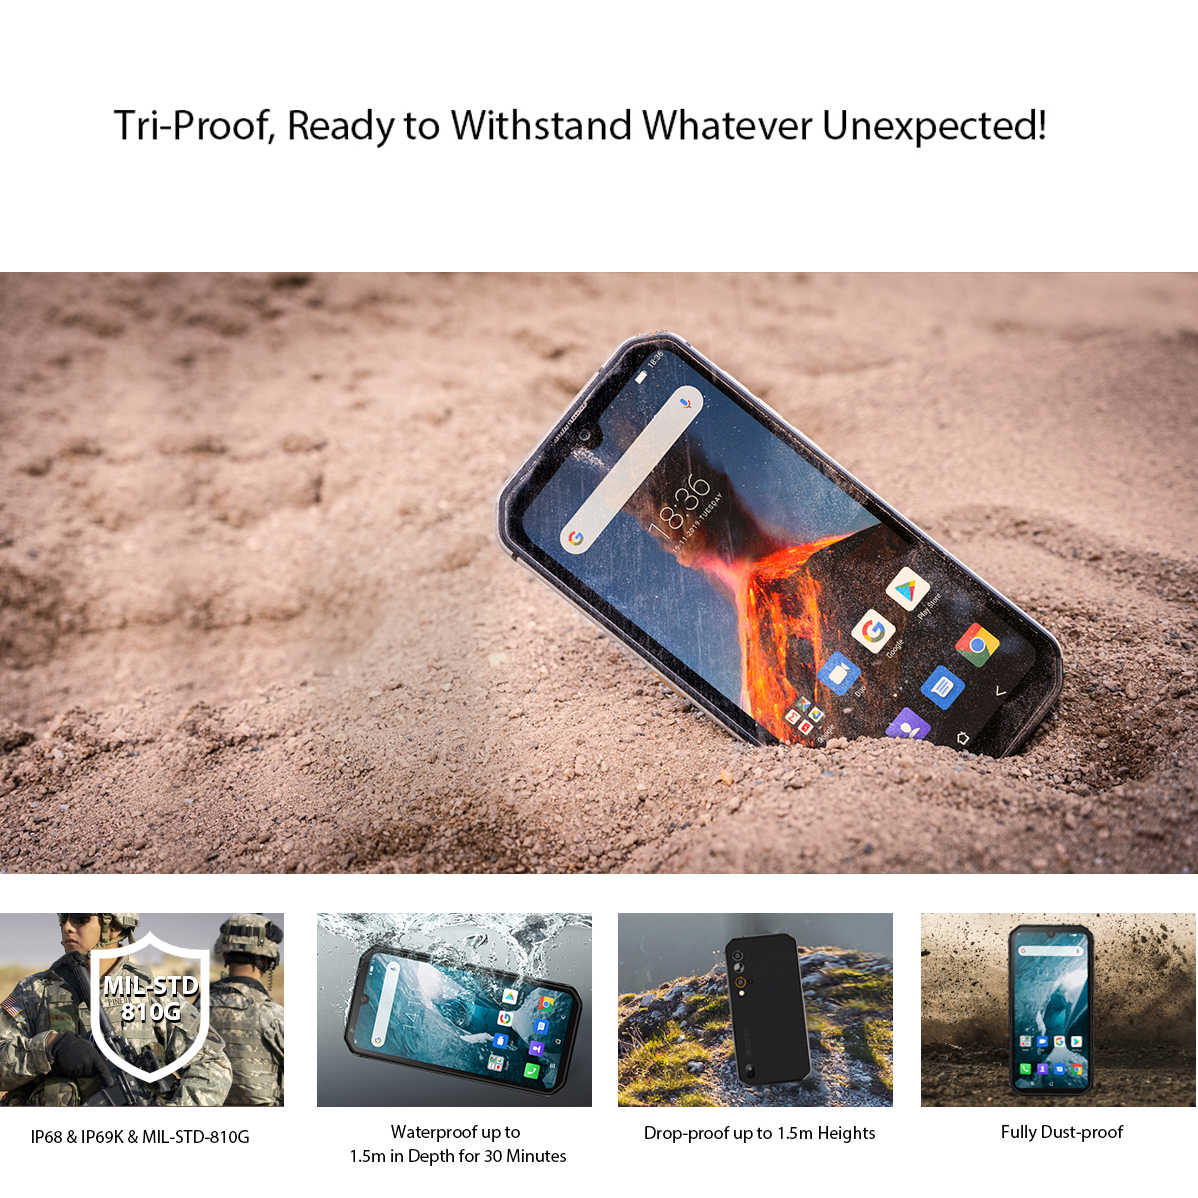 Blackview BV9900 Pro cámara térmica teléfono móvil Helio P90 Octa Core 8GB + 128GB IP68 robusto Smartphone 48MP Quad cámara trasera